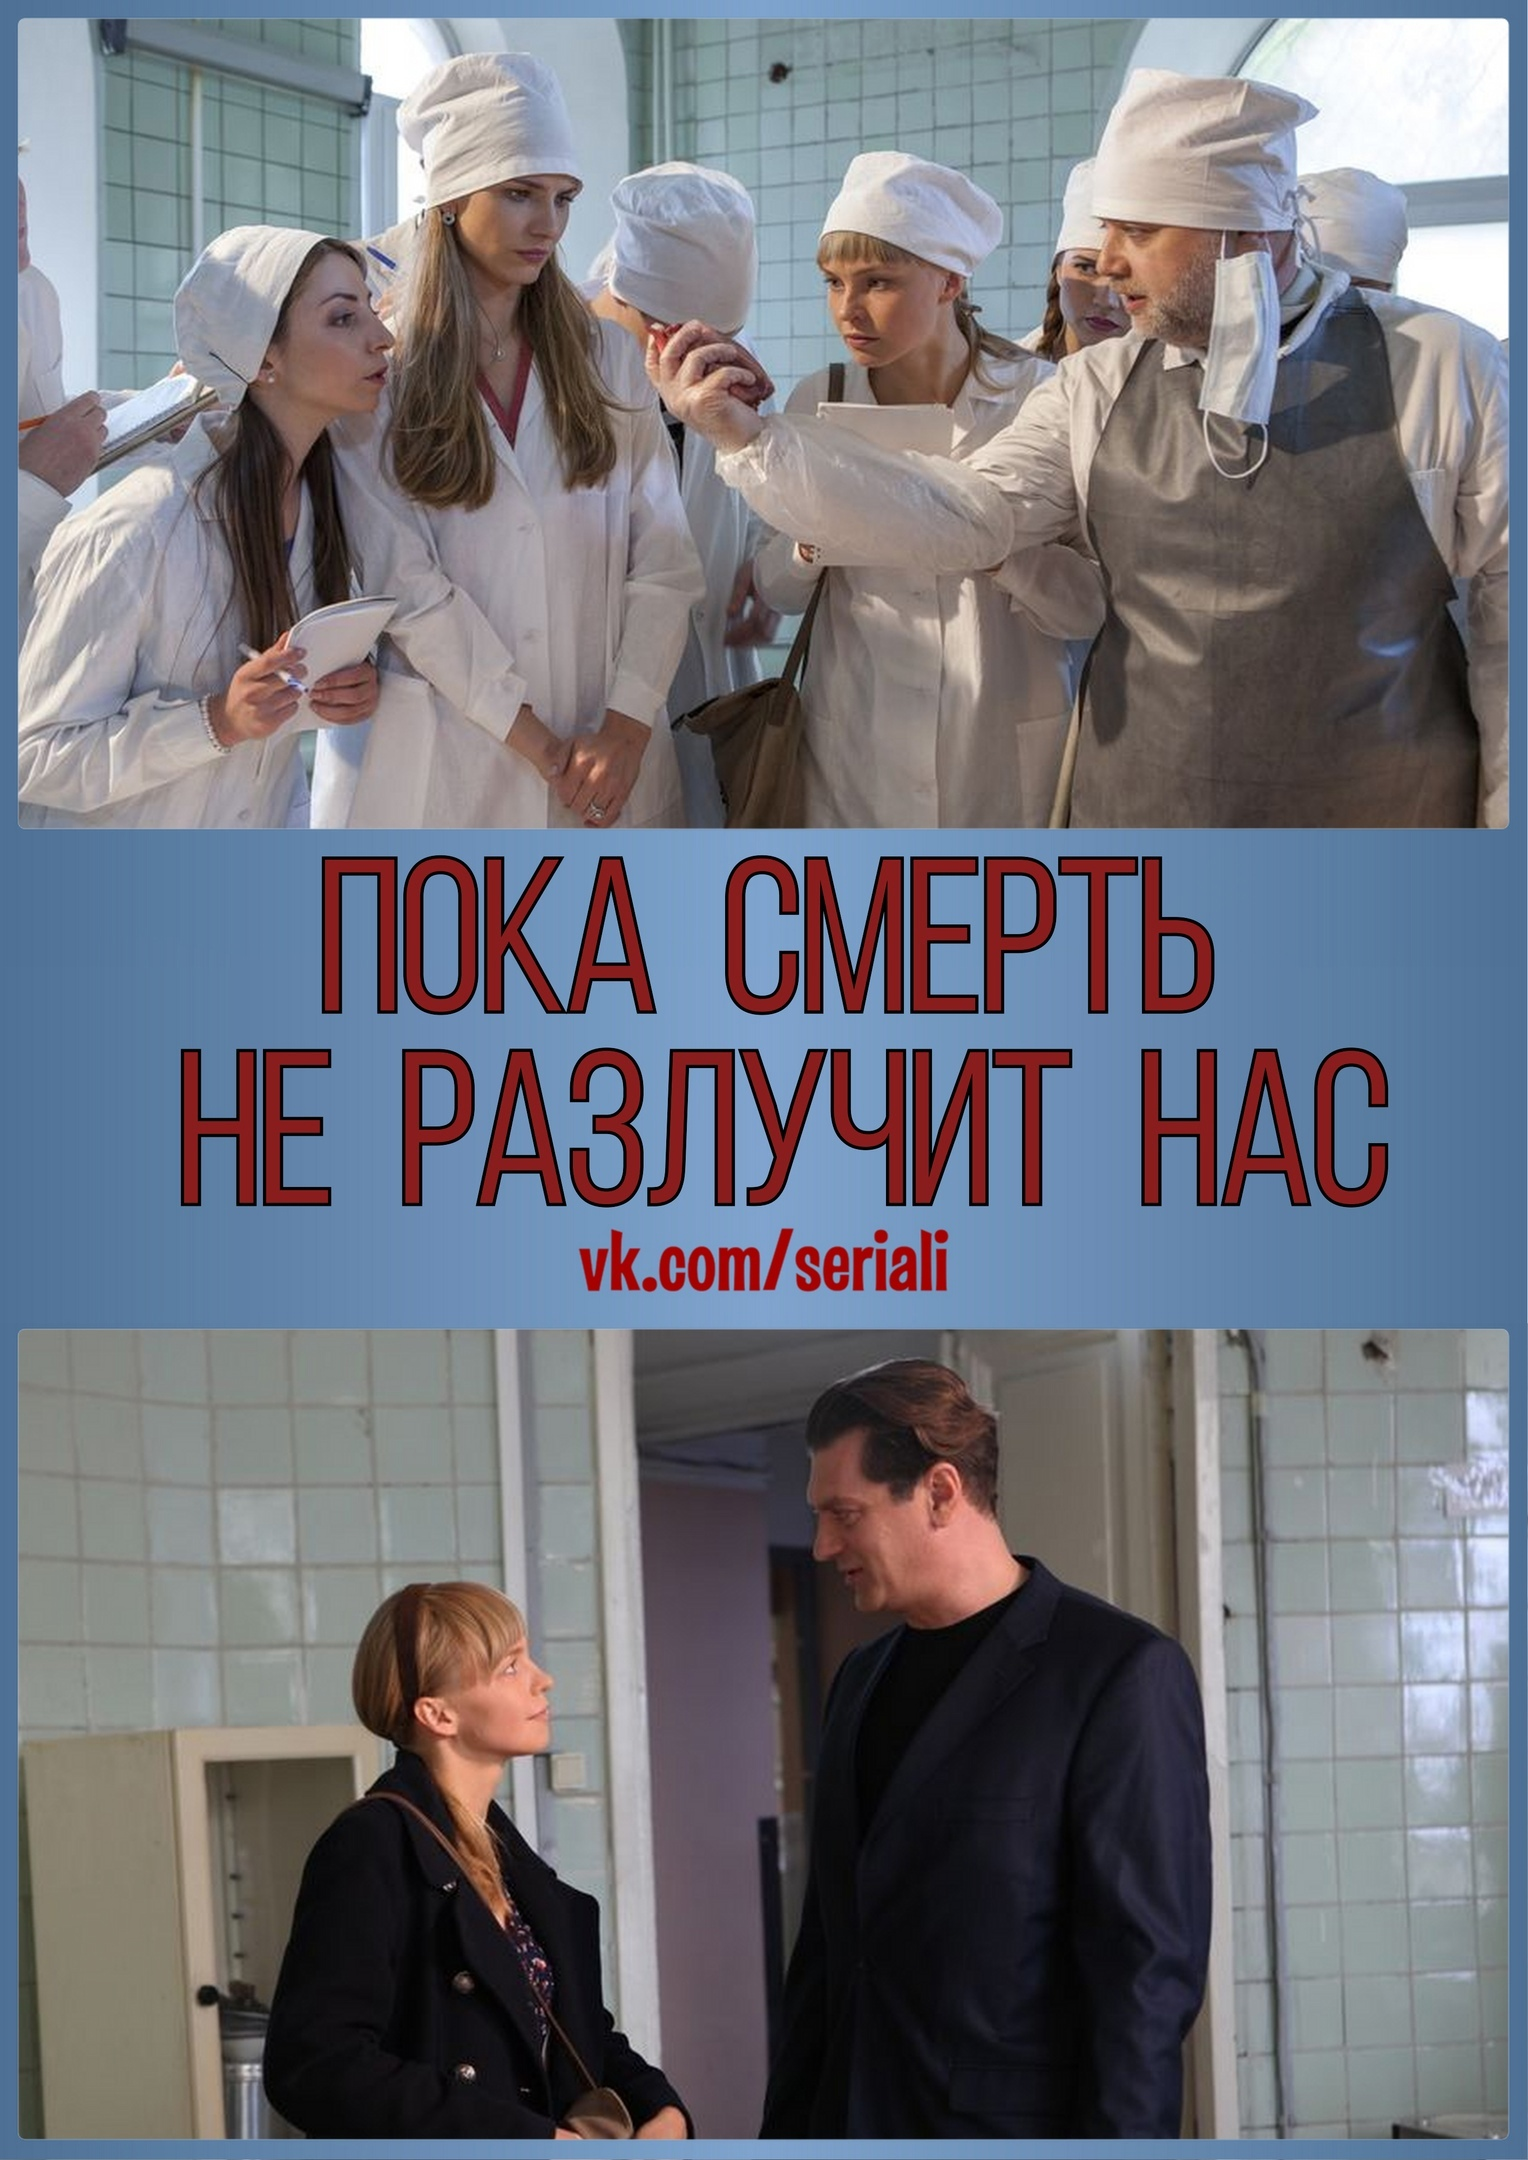 Мелодрама «Пoкa cмepть нe paзлyчит нac» (2017) 1-4 серия из 4 HD